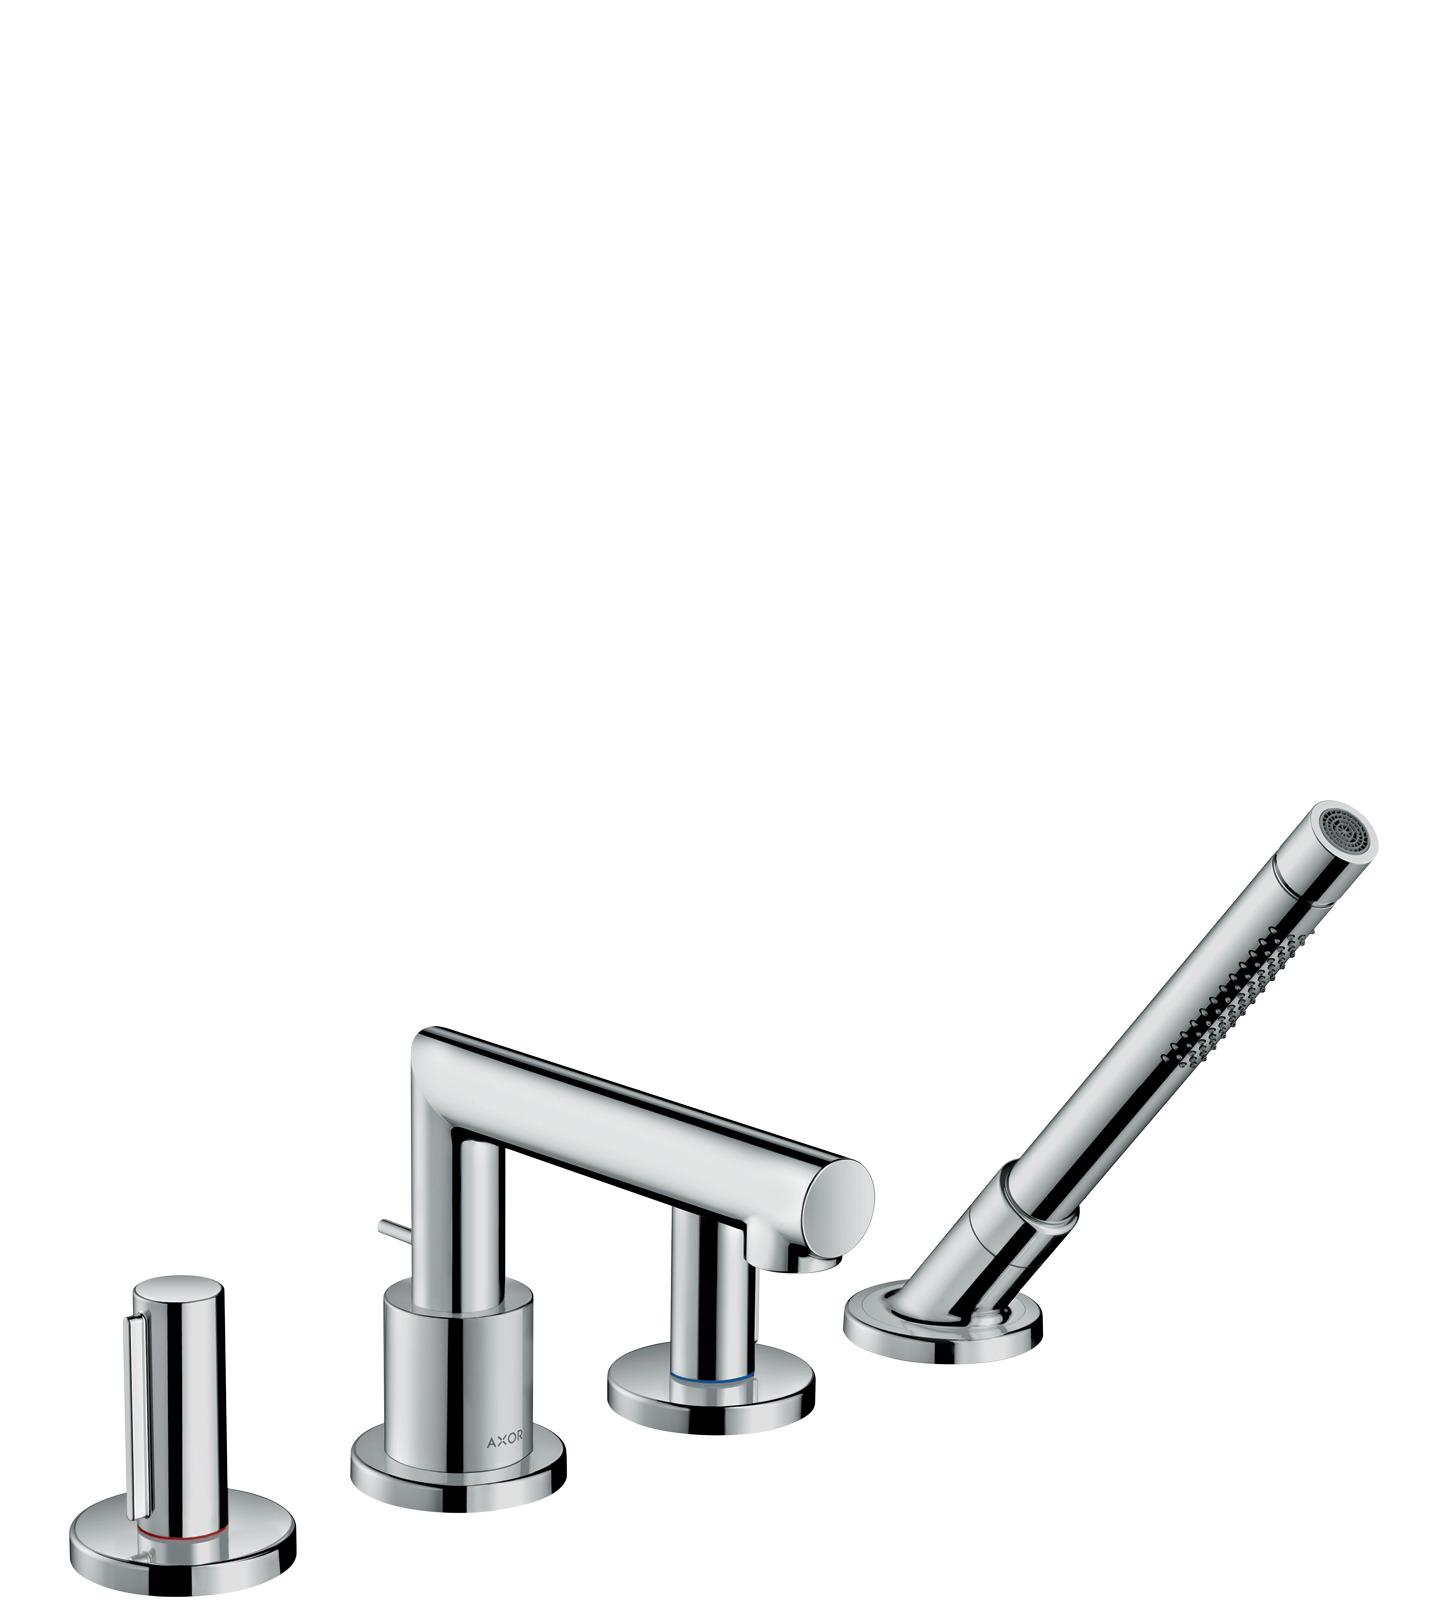 Axor Uno Bath Faucets 2 Outlets Chrome 45448001